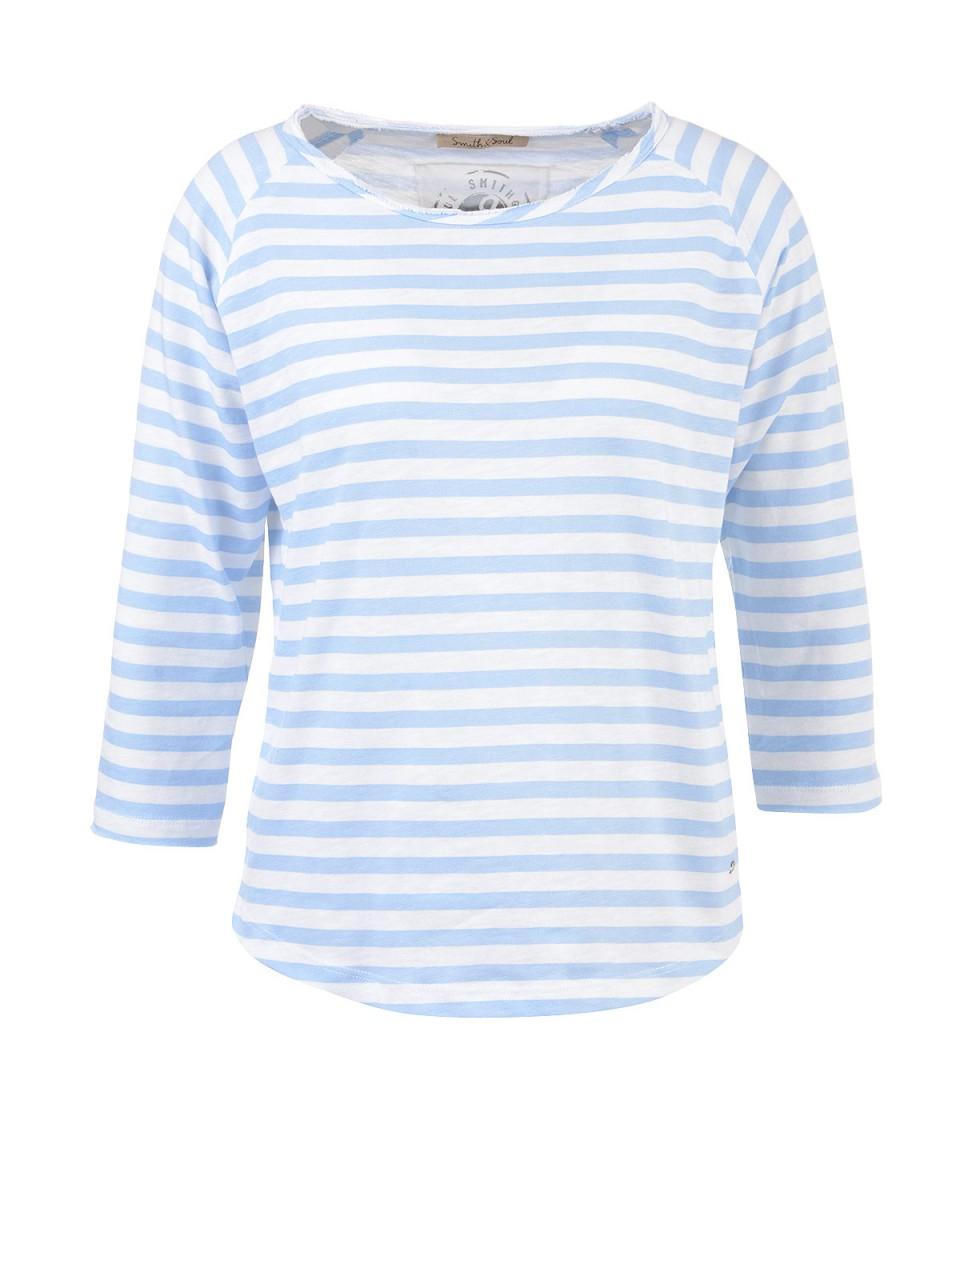 smith-amp-soul-damen-shirt-hellblau-wei-szlig-